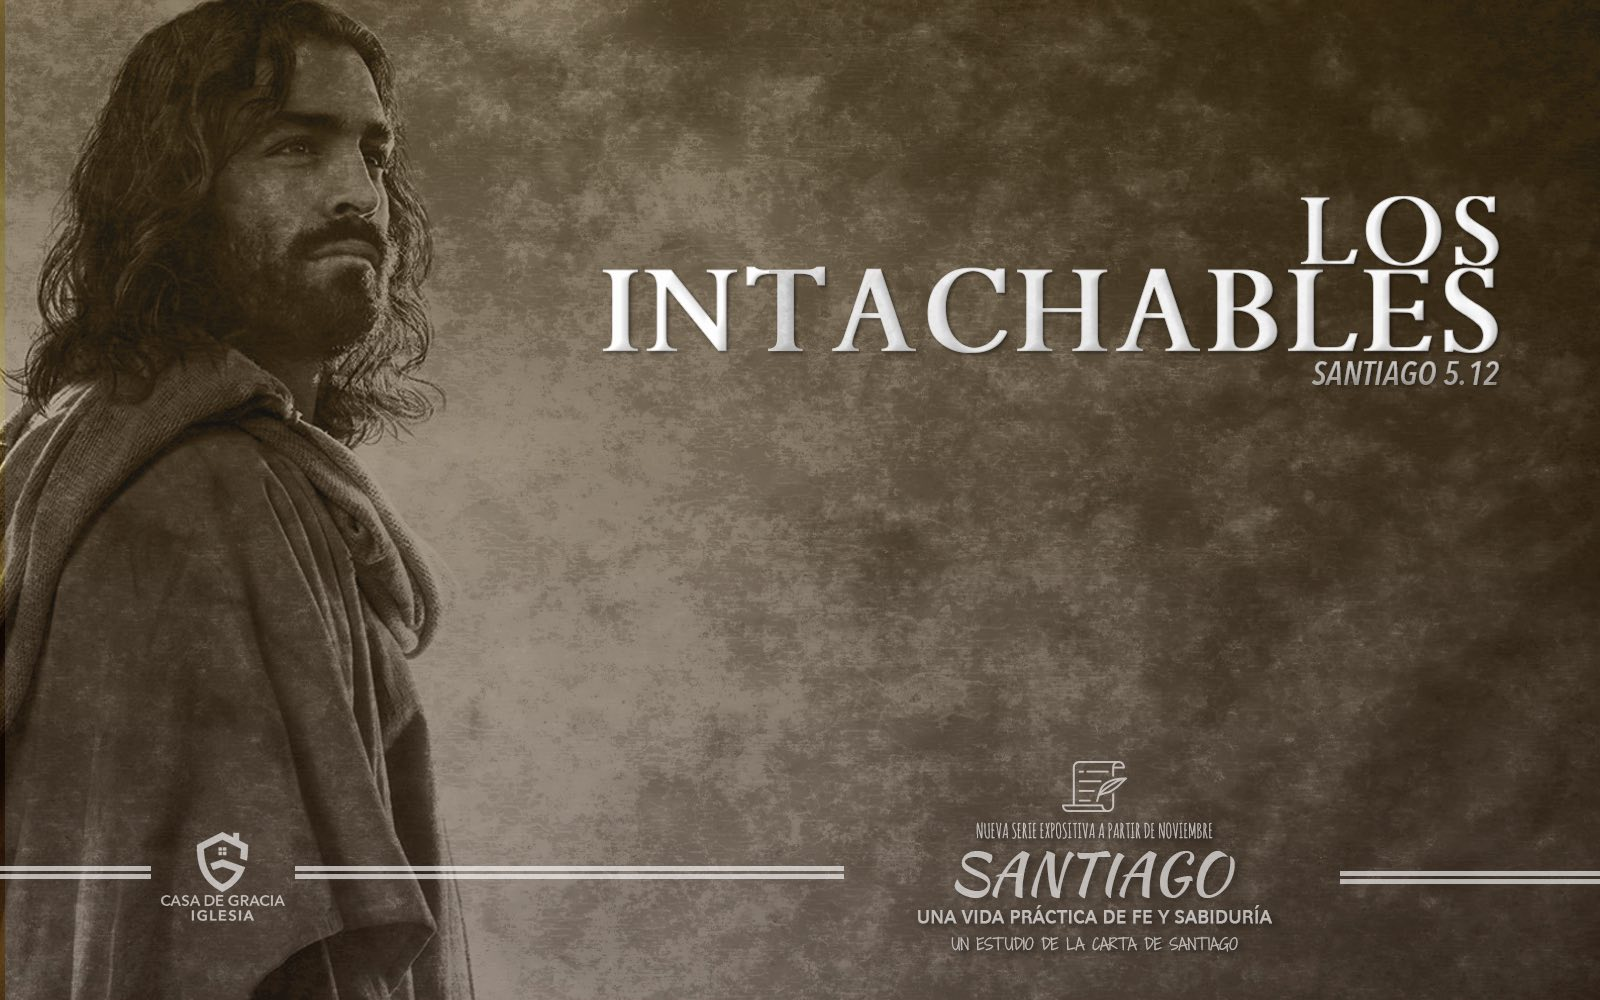 Los intachables - Iglesia Casa de Gracia